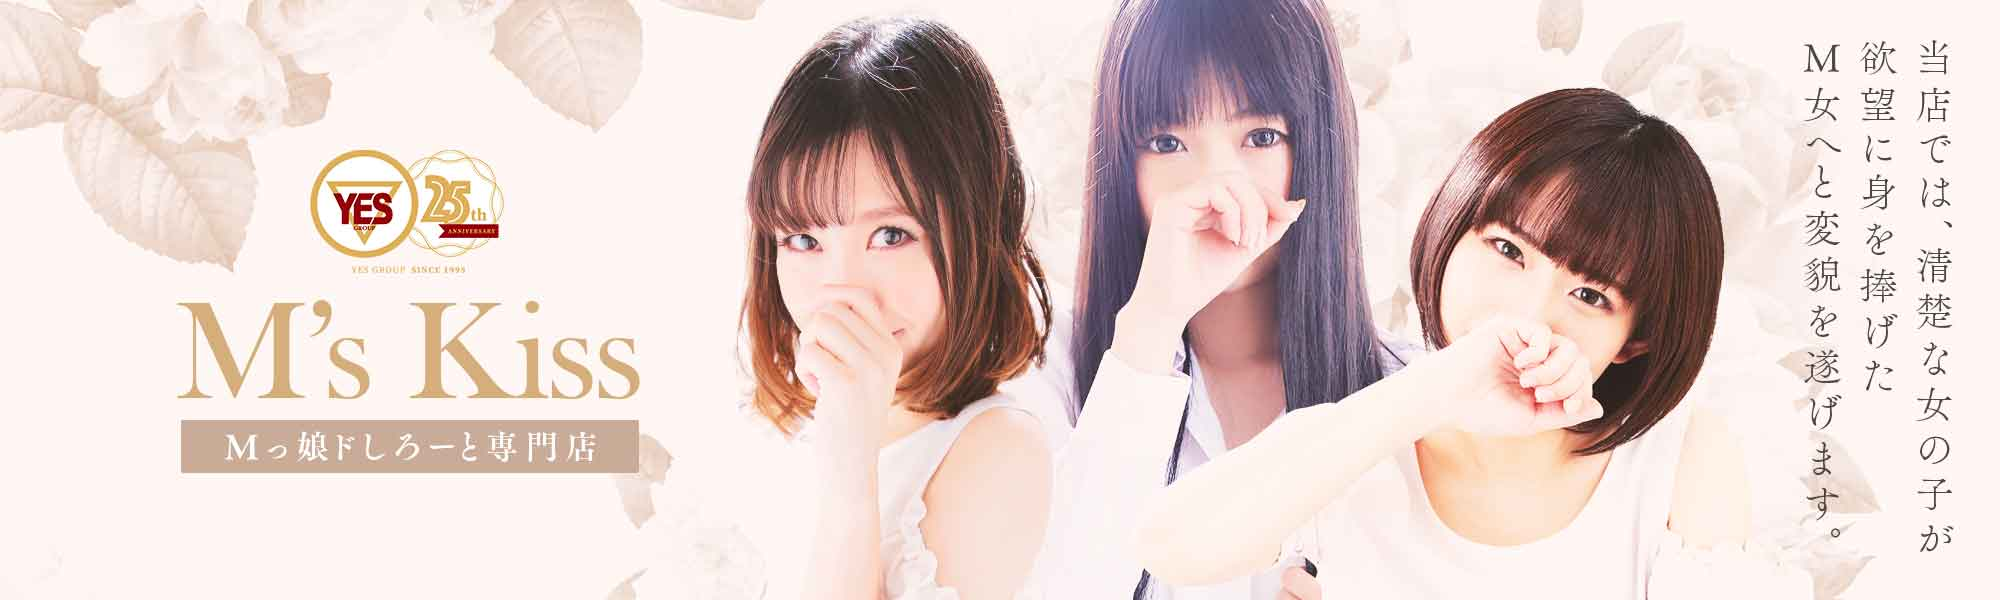 M's Kiss(エムズキッス)